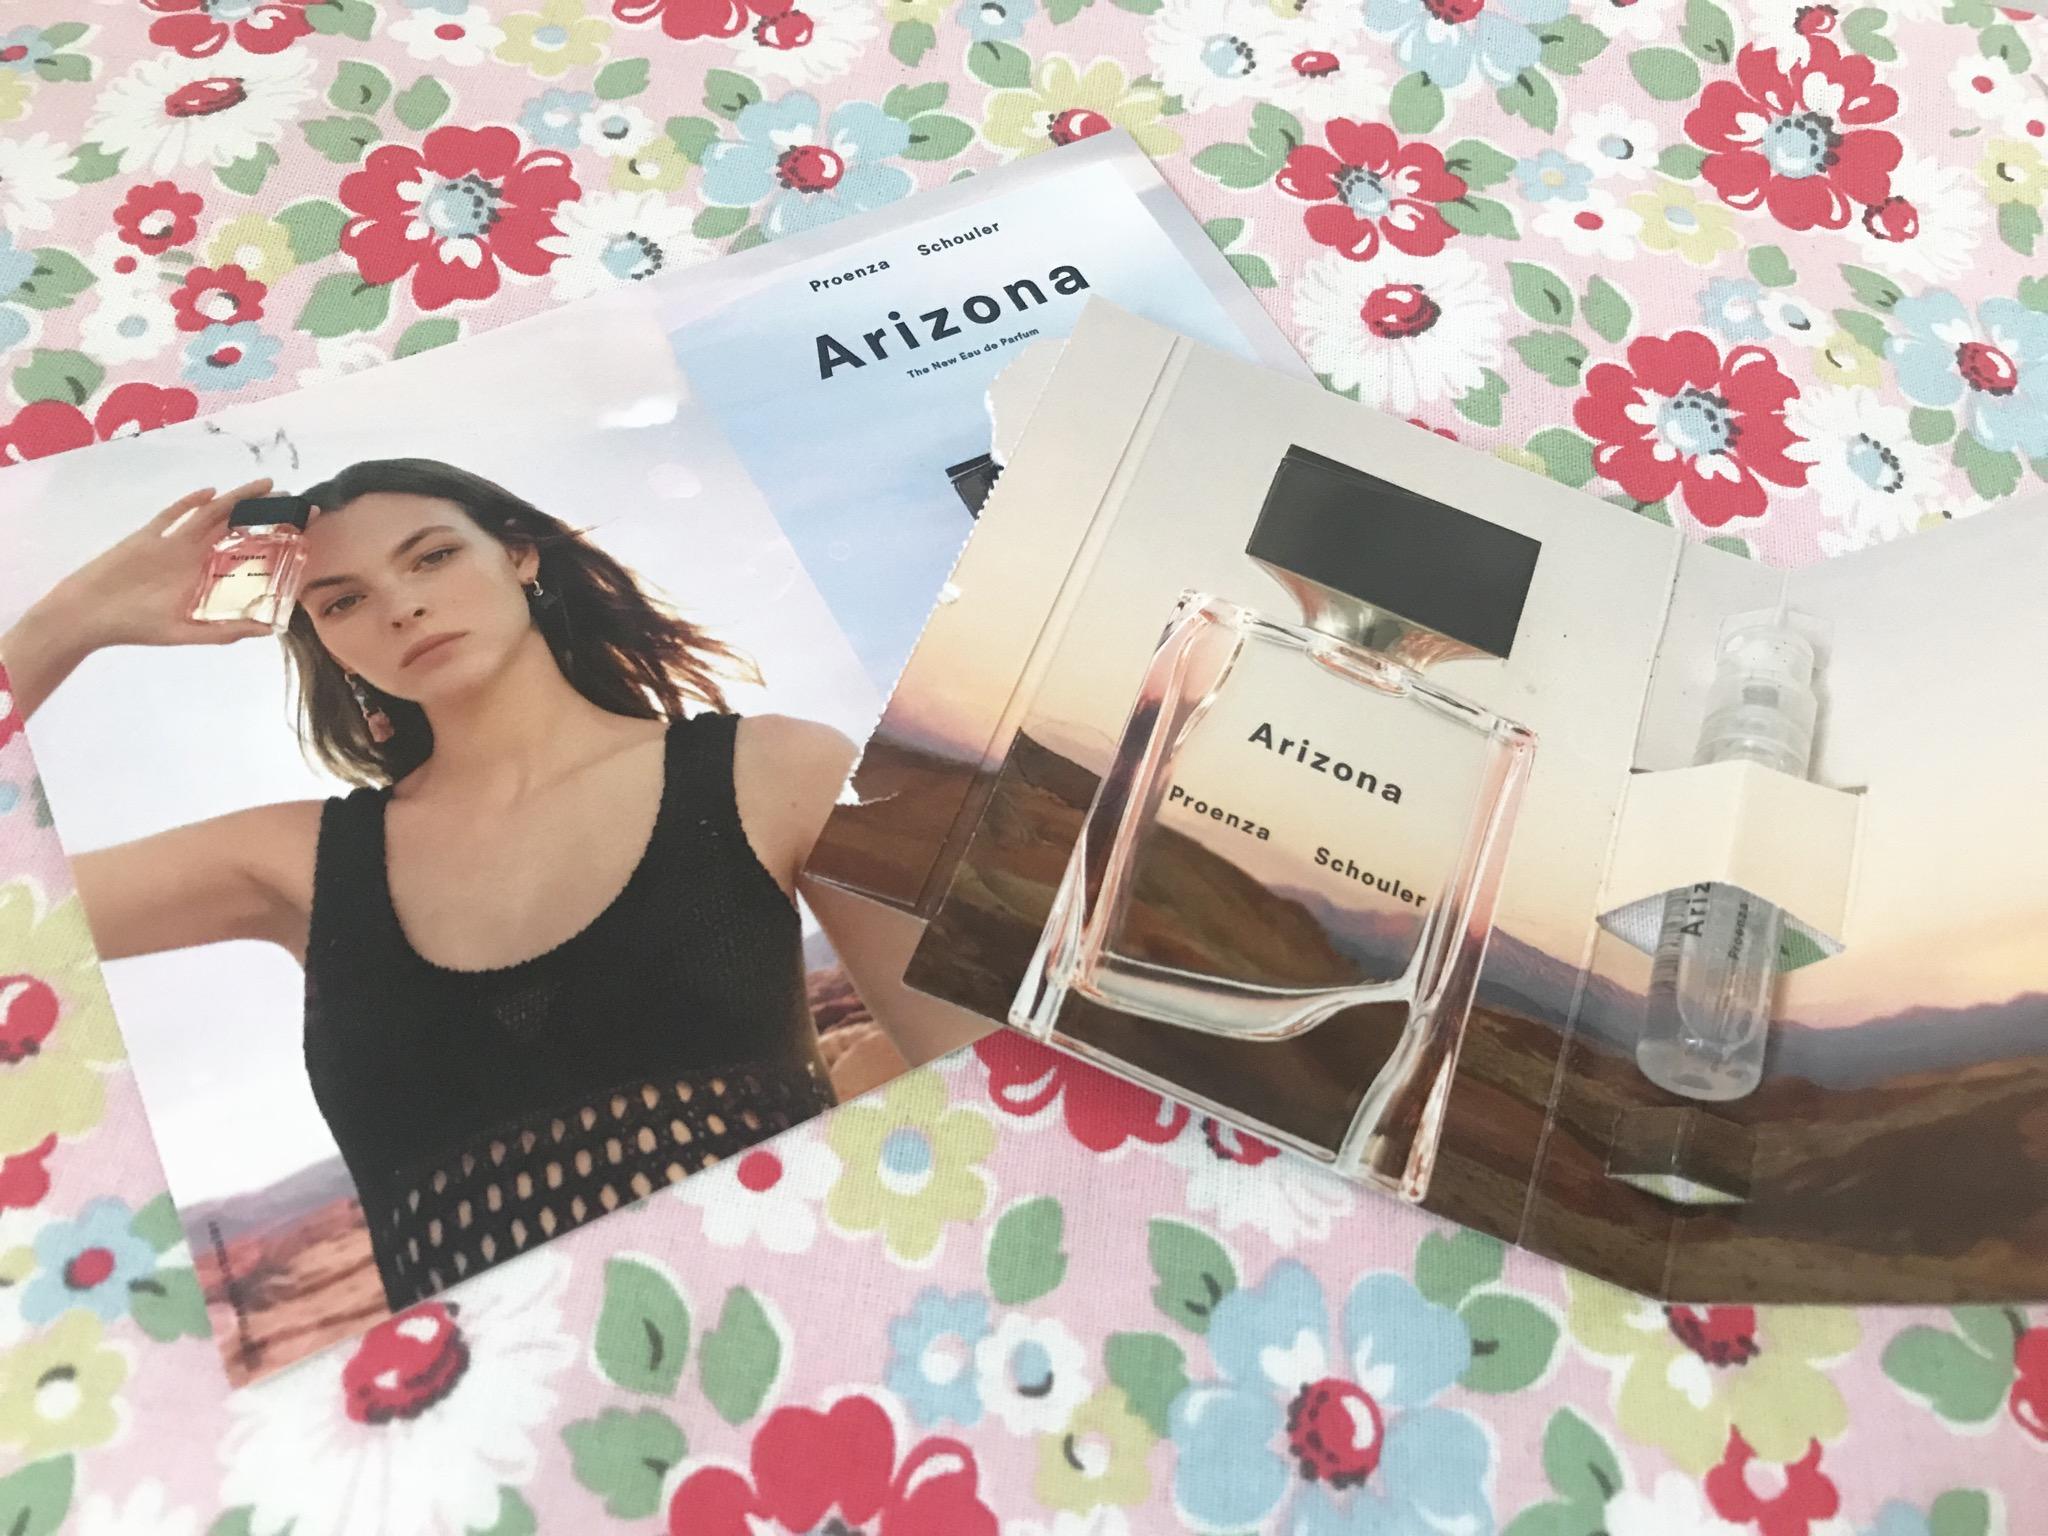 free Arizona perfume